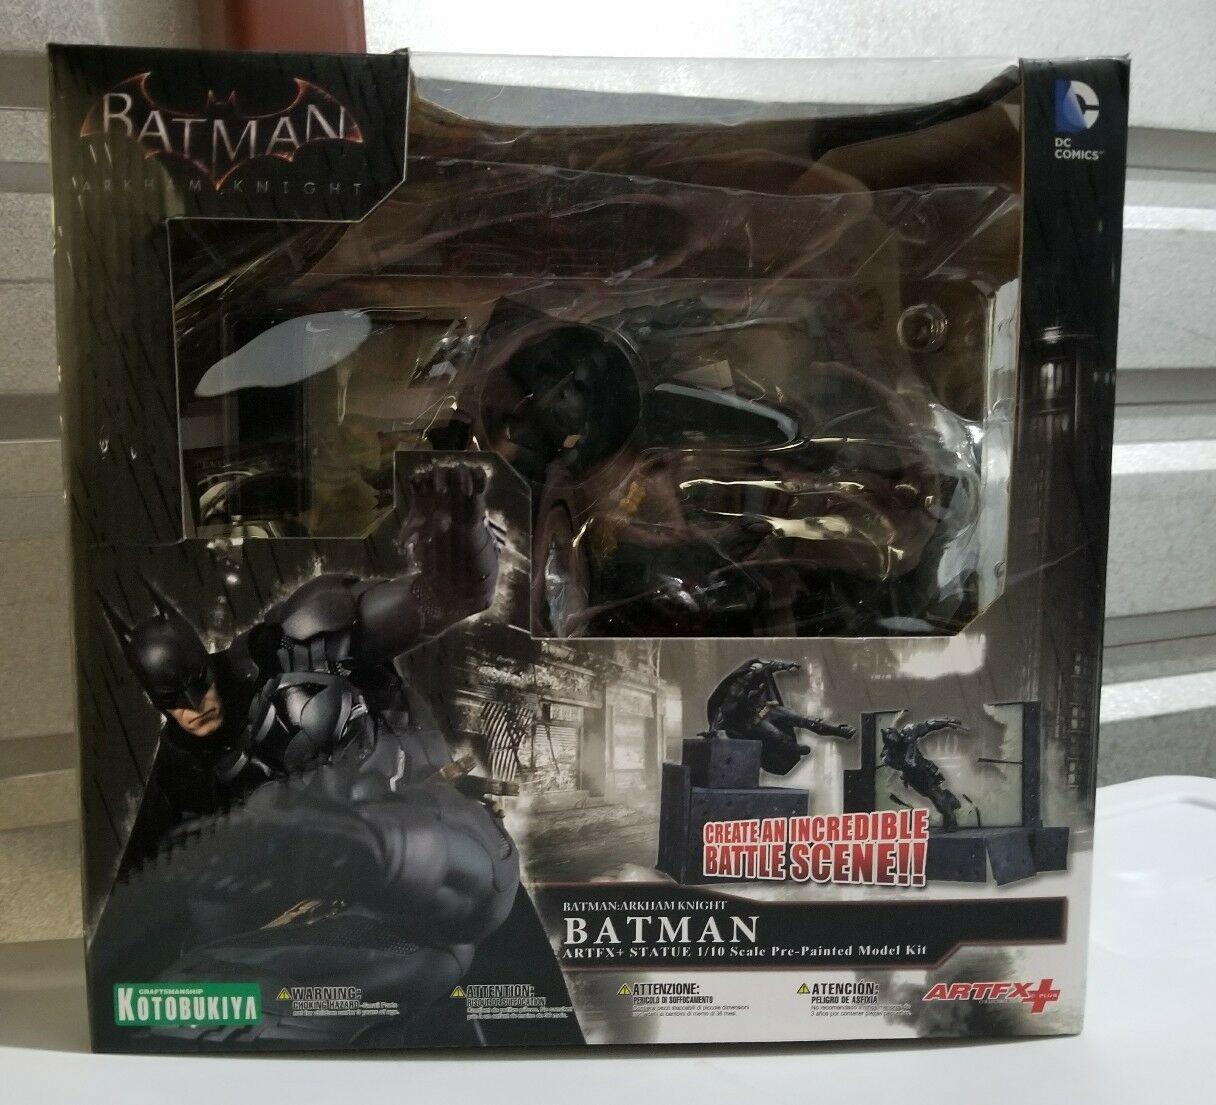 ARTFX KOTOBUKIYA Batman Arkham Knight scène de bataille